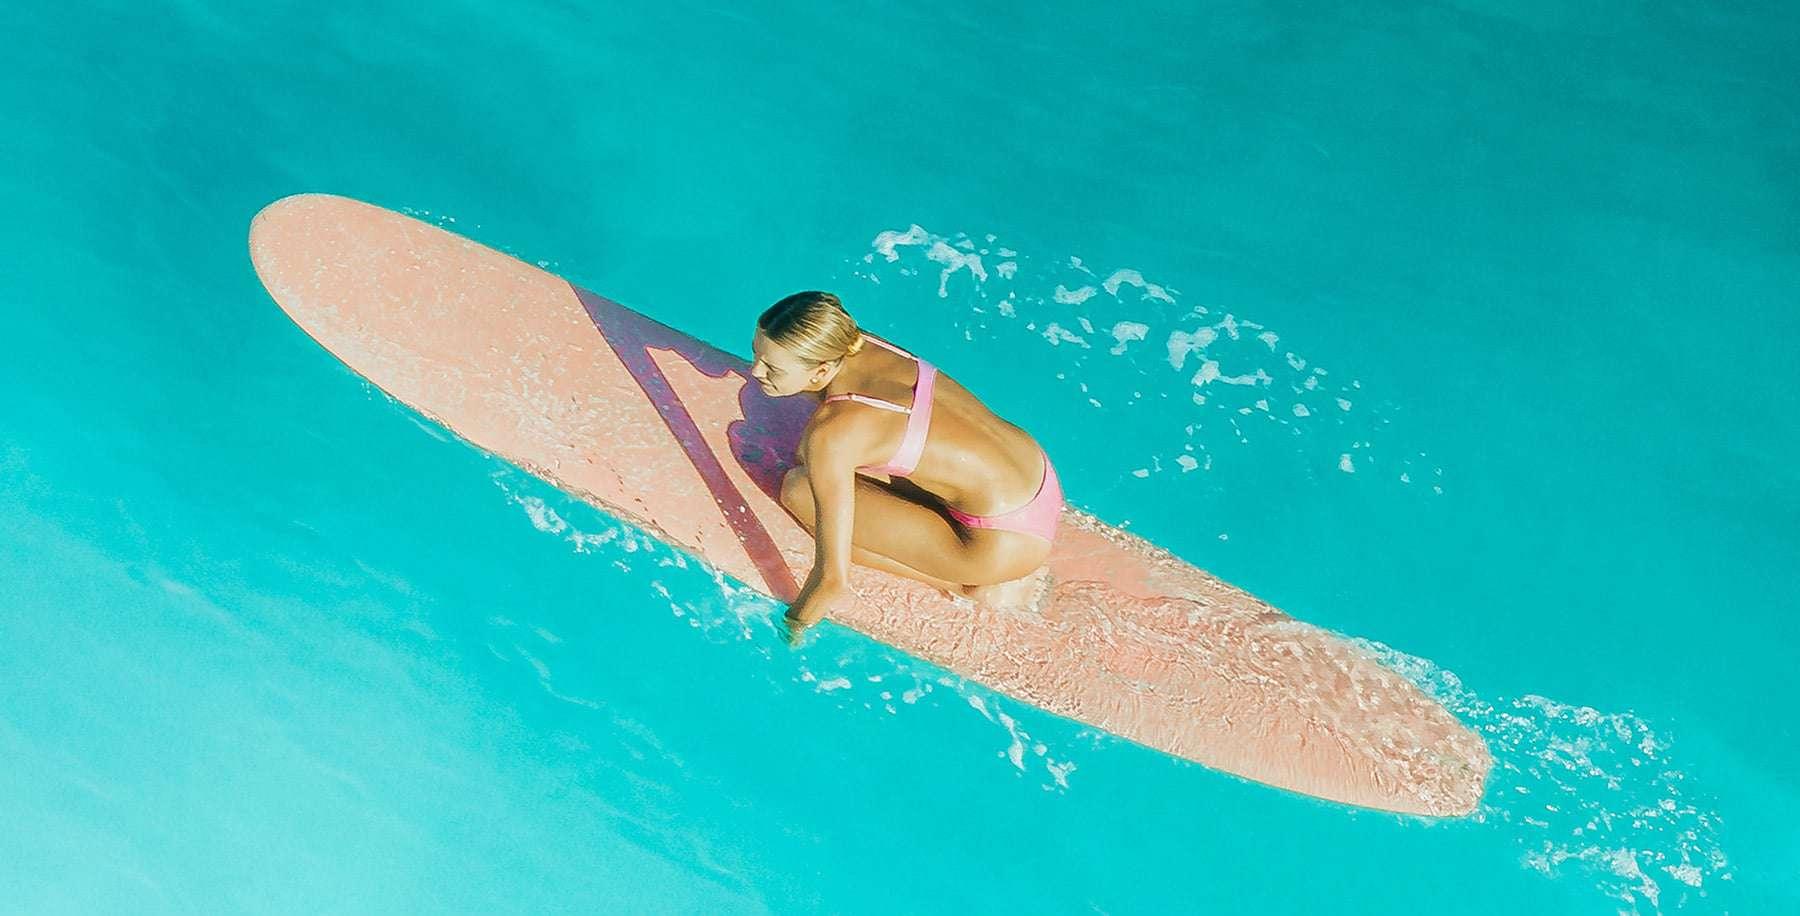 surfing surfing dominican republic